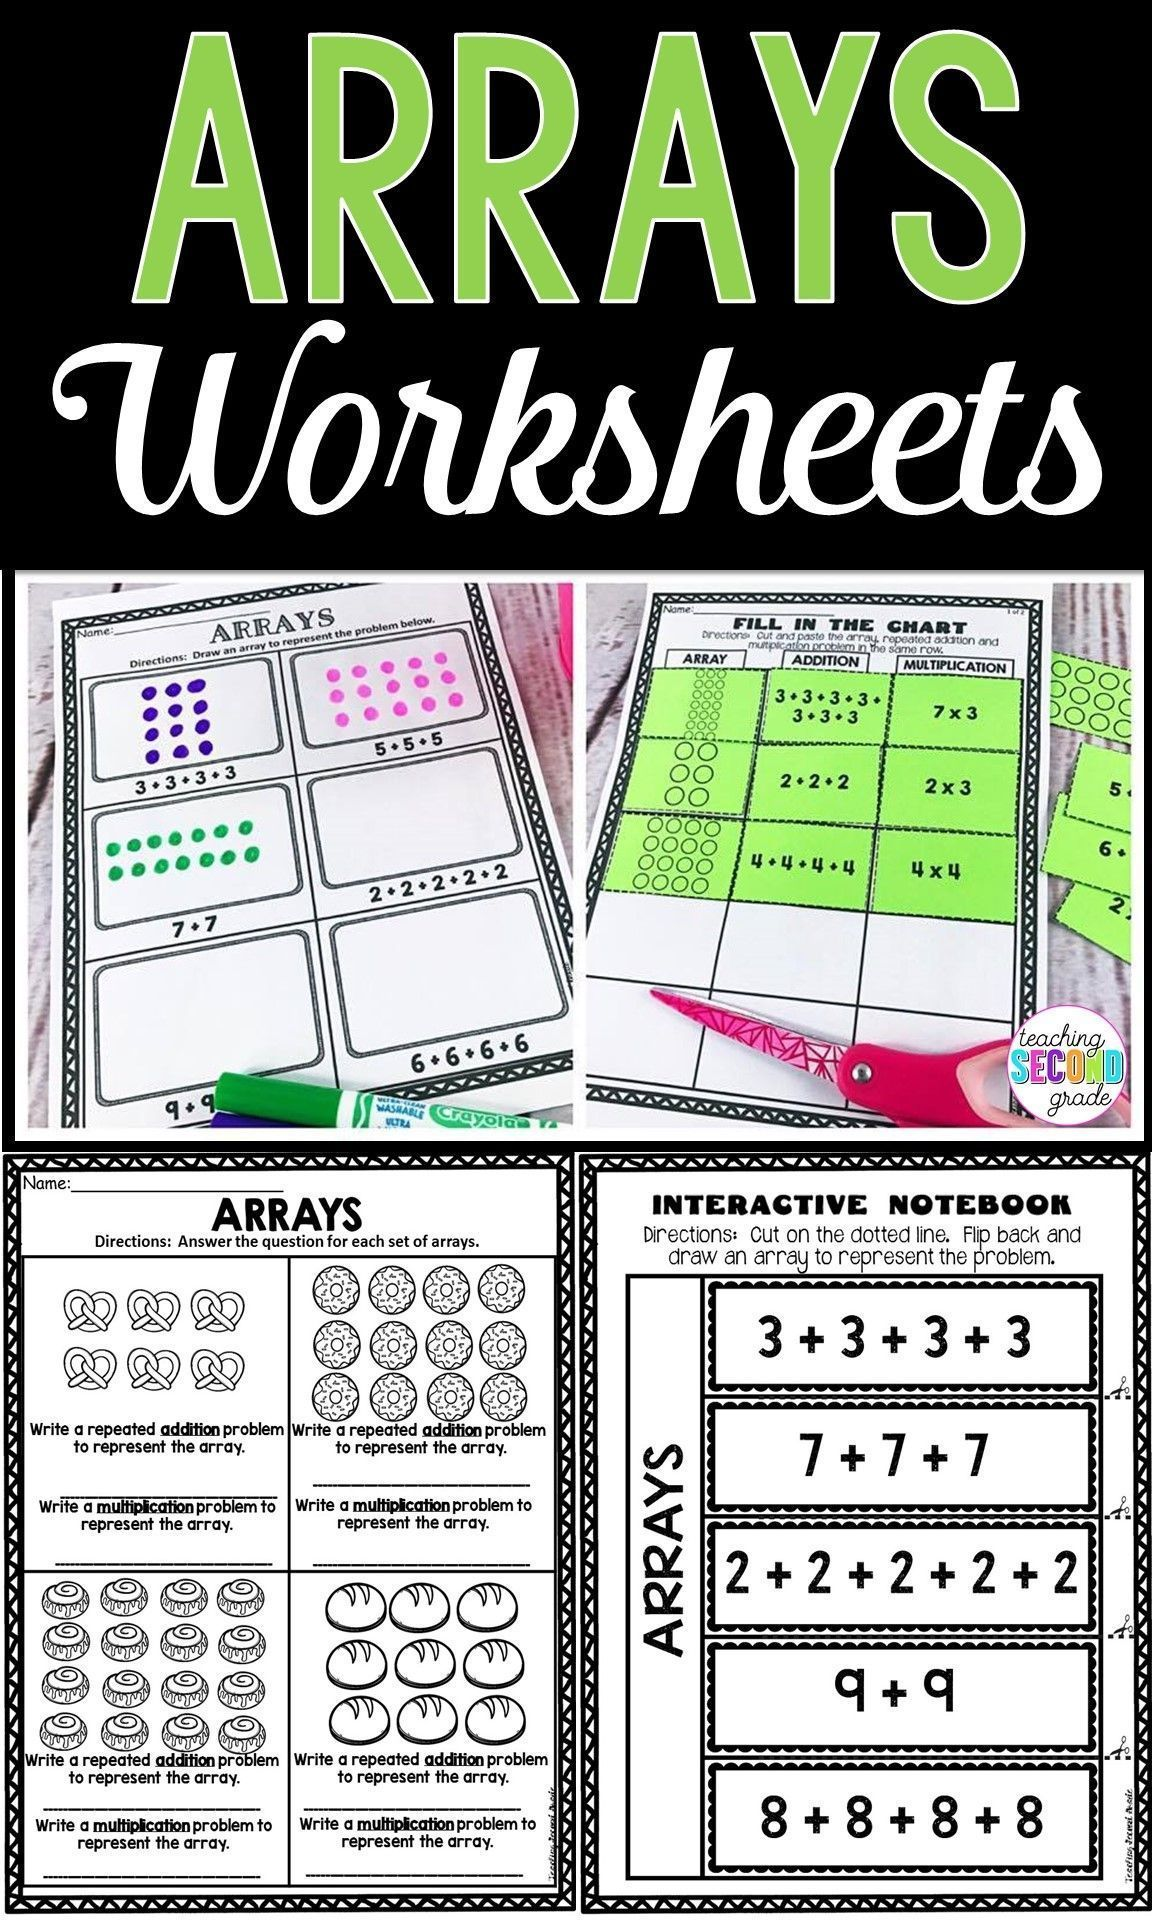 16 Best Array Worksheets Images On Best Worksheets Collection